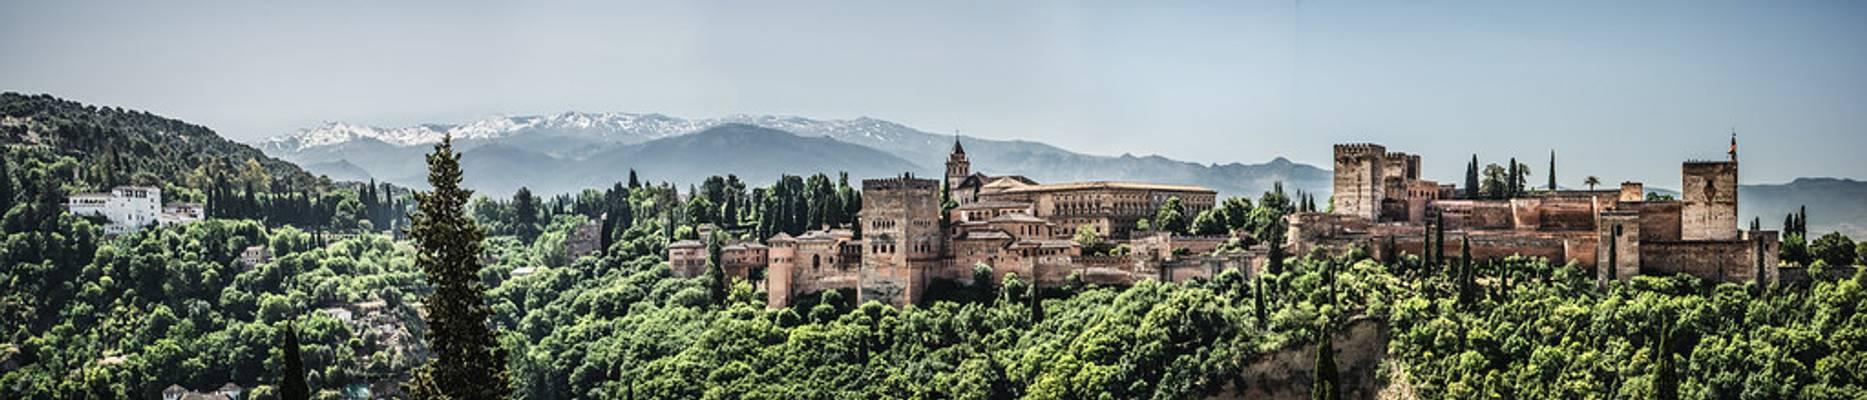 Panorámica clásica de la Alhambra de Granada